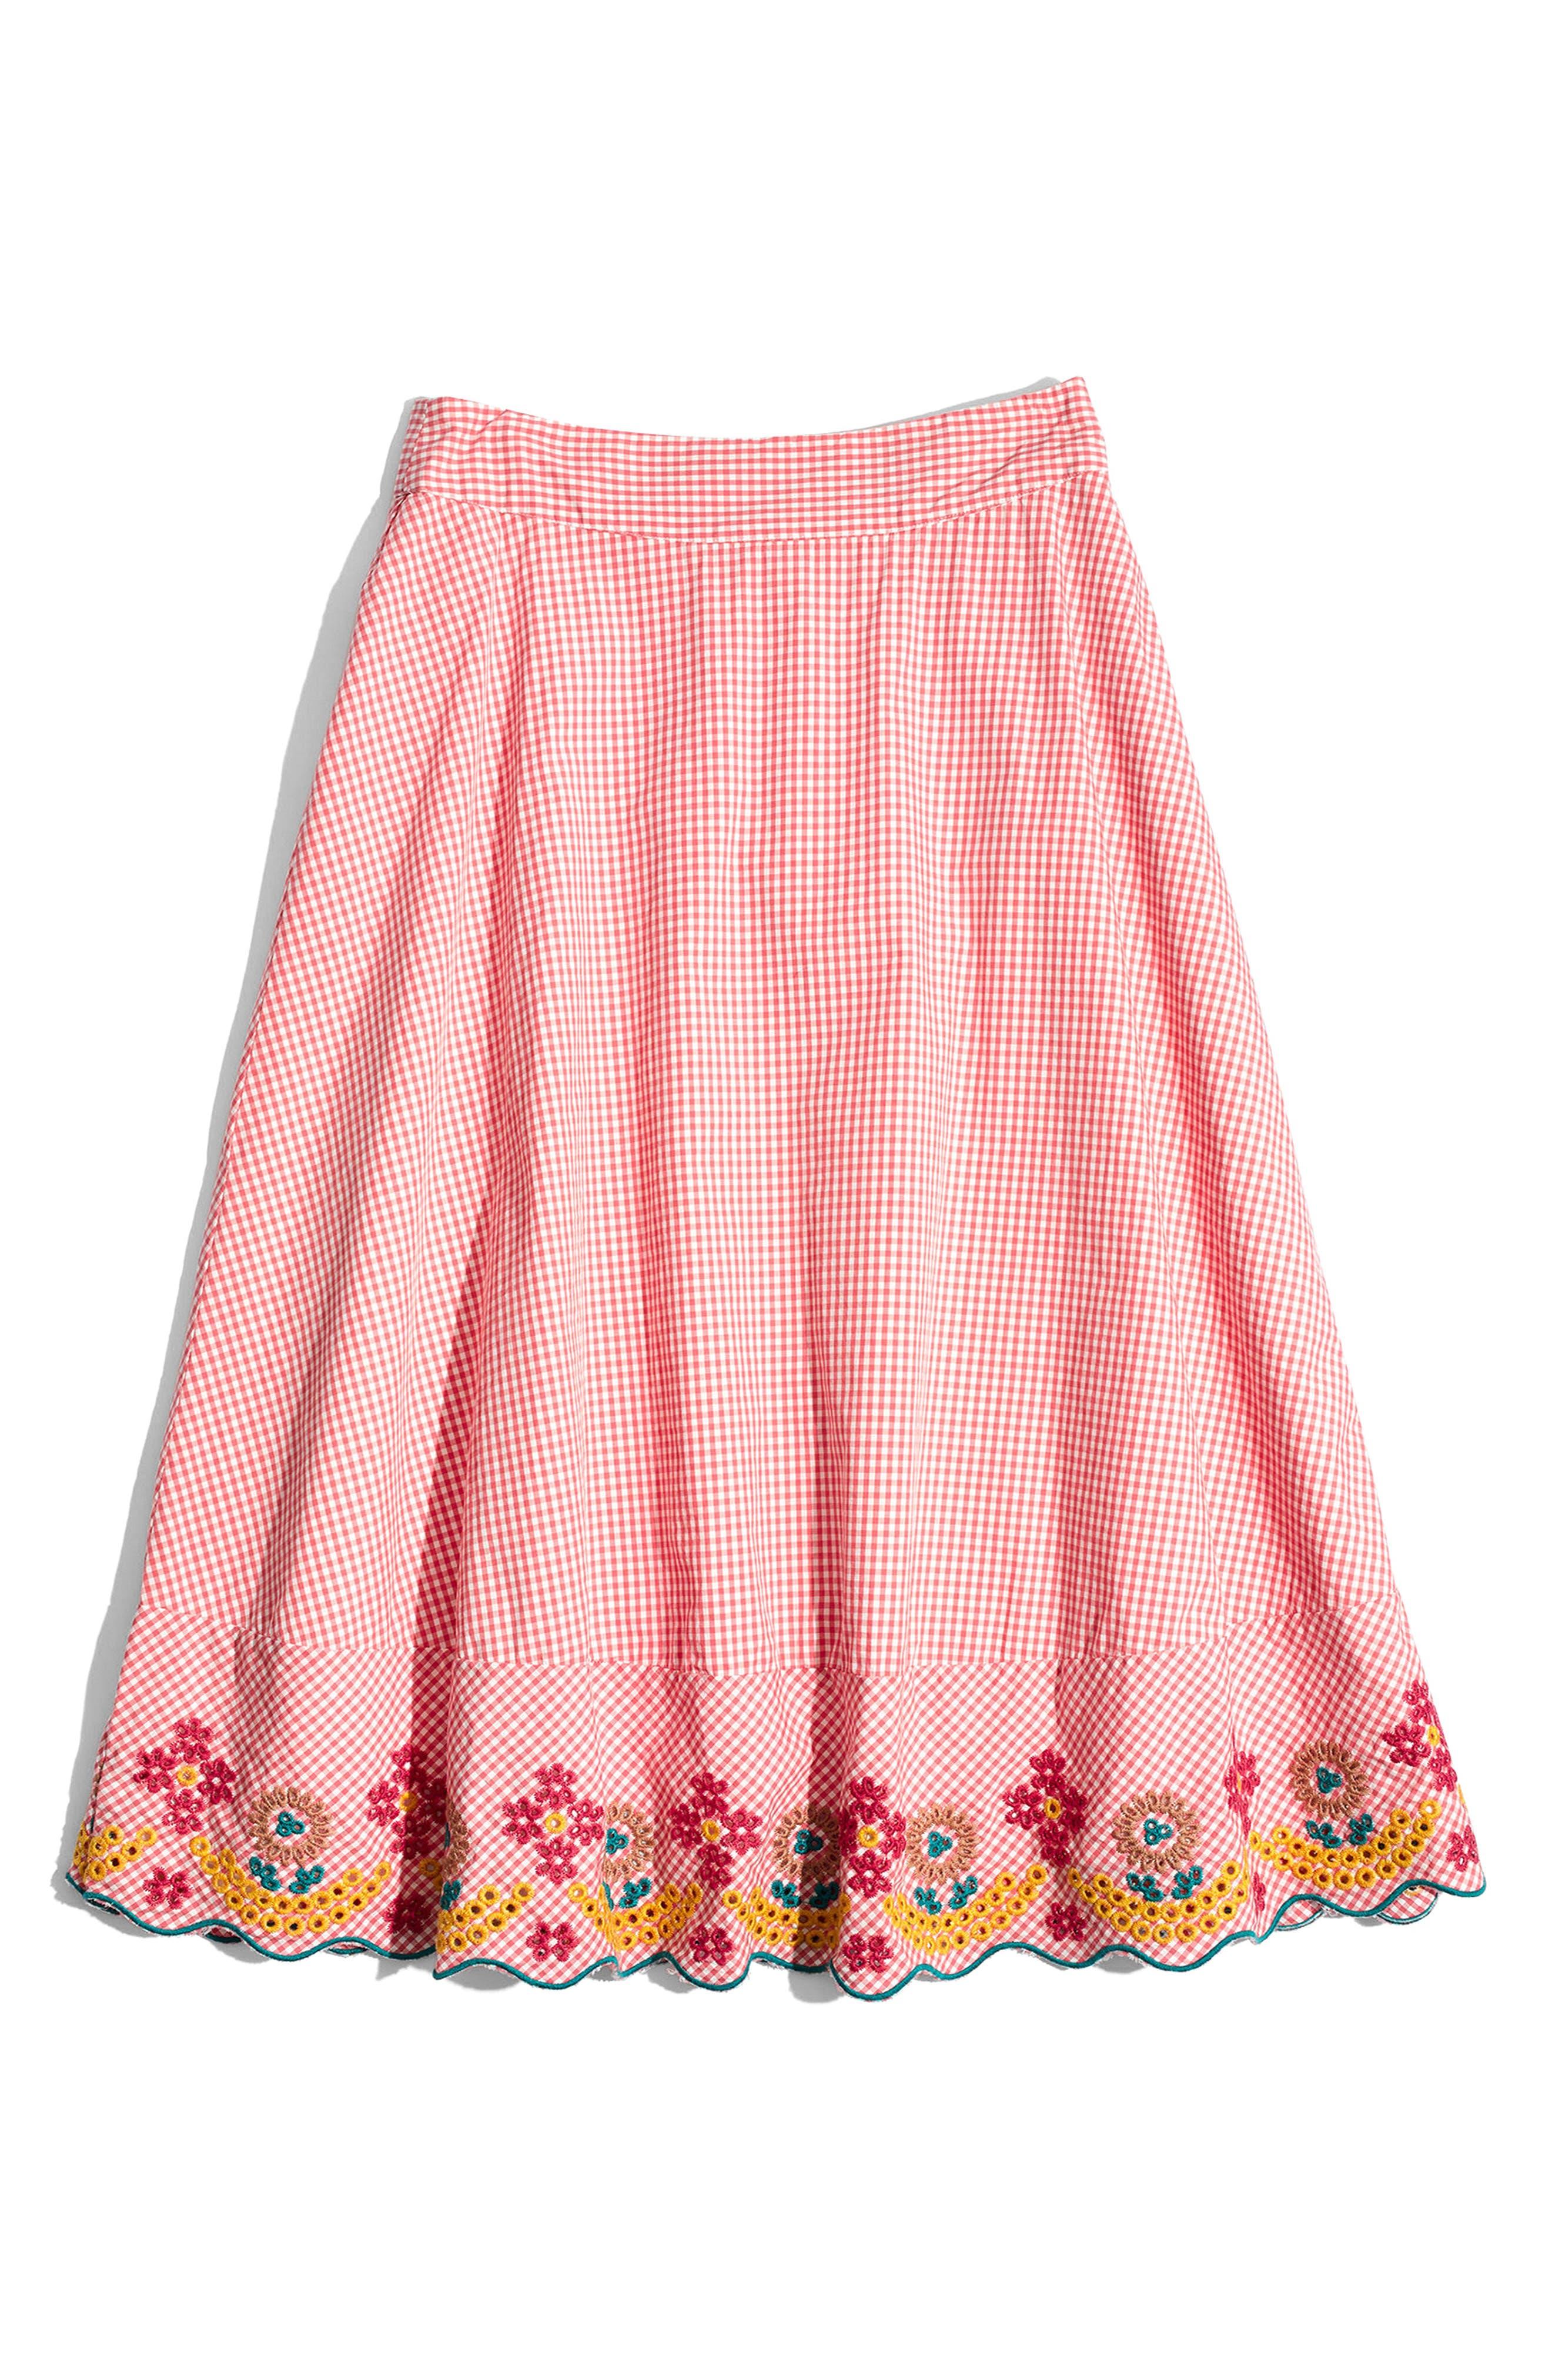 Embroidered Gingham Circle Skirt,                             Alternate thumbnail 4, color,                             Gingham Sunset